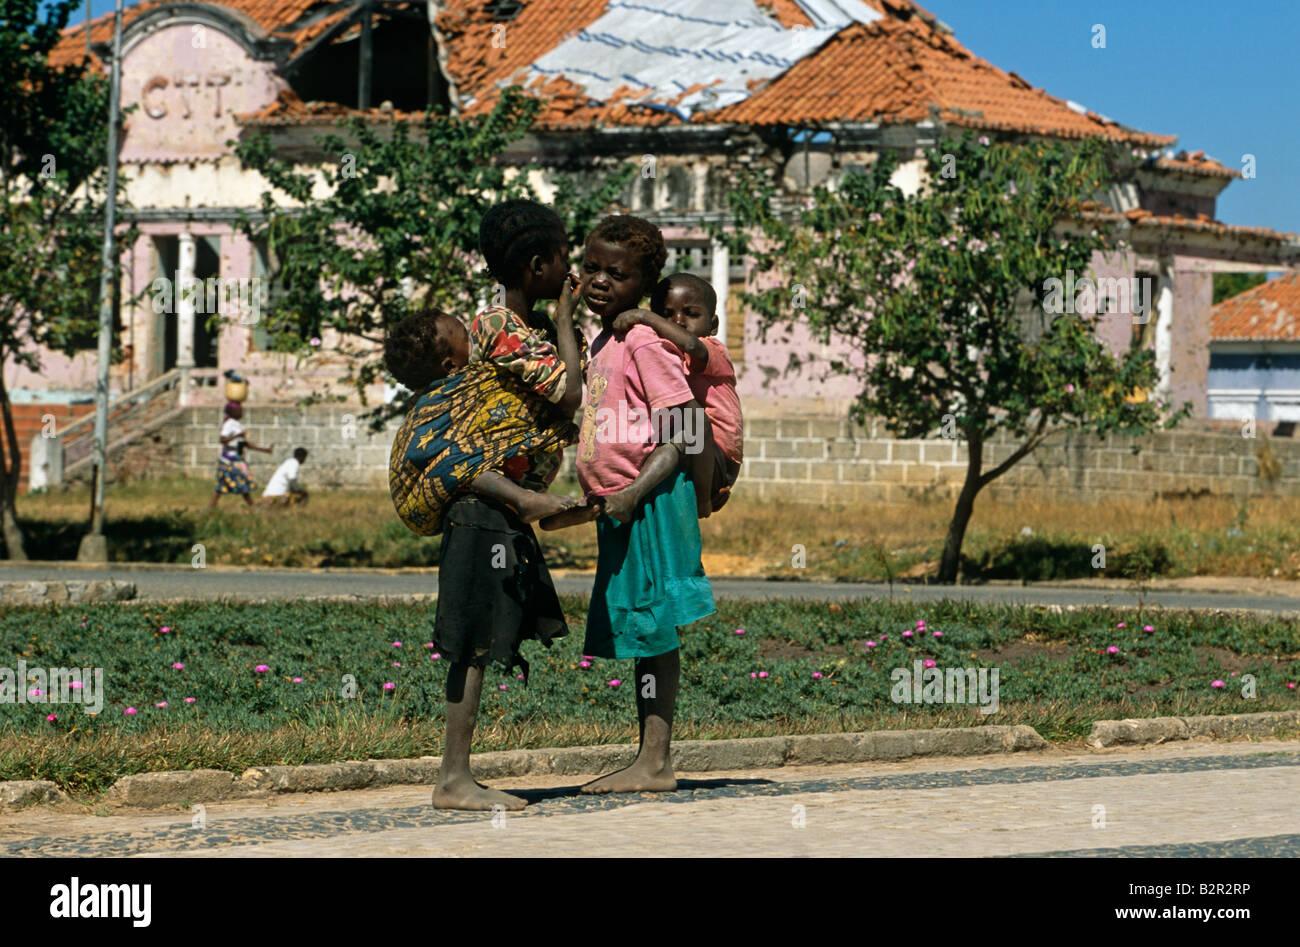 Street children in Luanda, Angola. - Stock Image